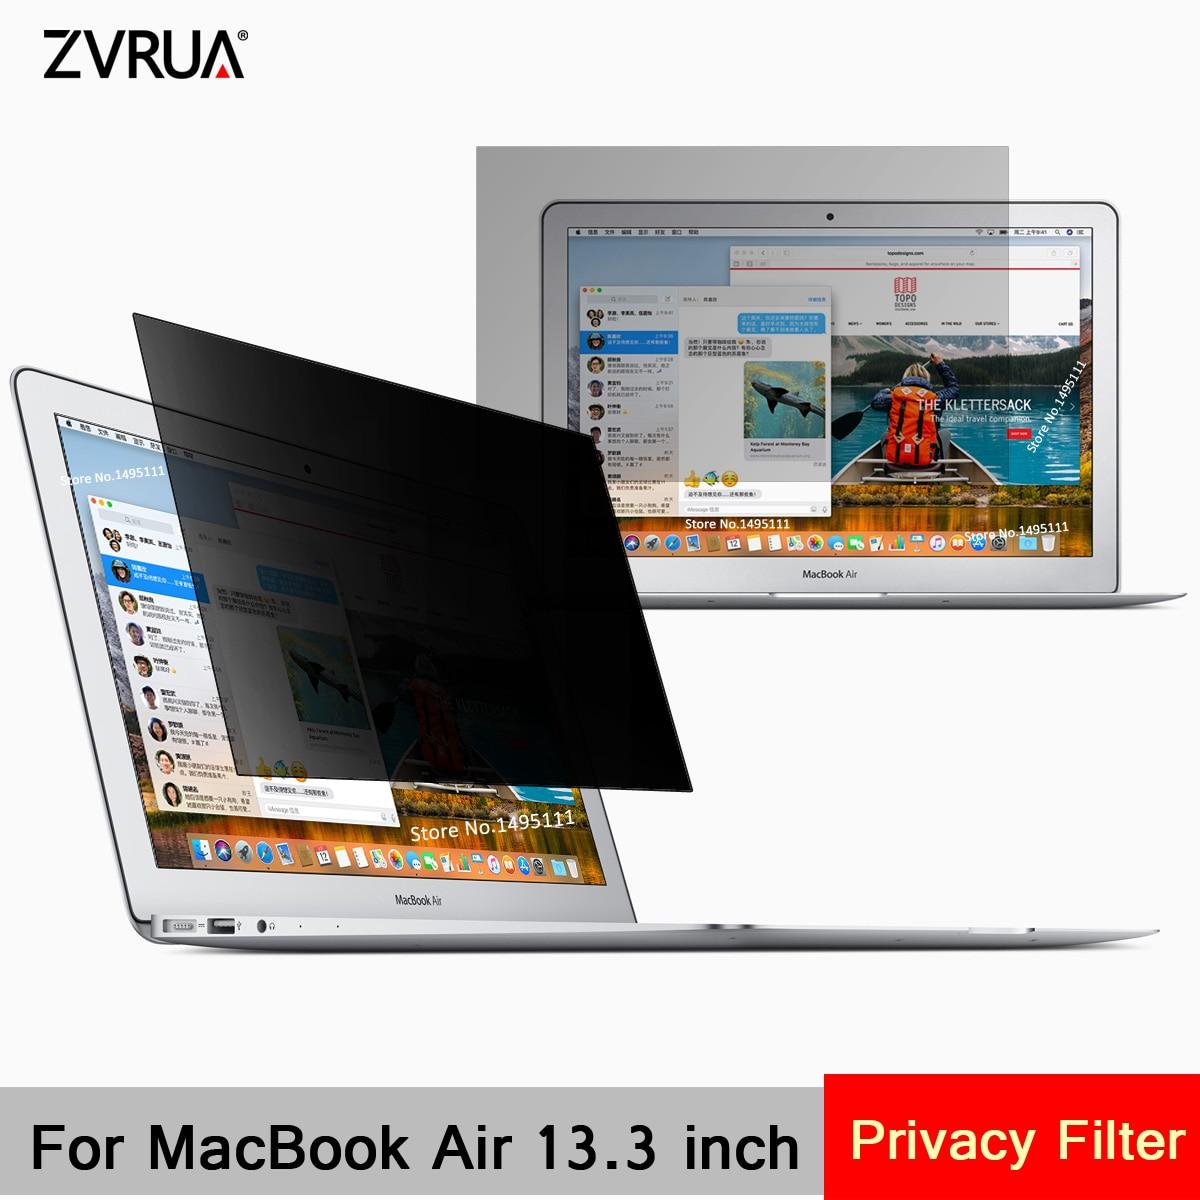 Para apple macbook ar 13.3 polegadas (286mm * 179mm) filtro de privacidade portátil notebook anti-reflexo protetor de tela película protetora